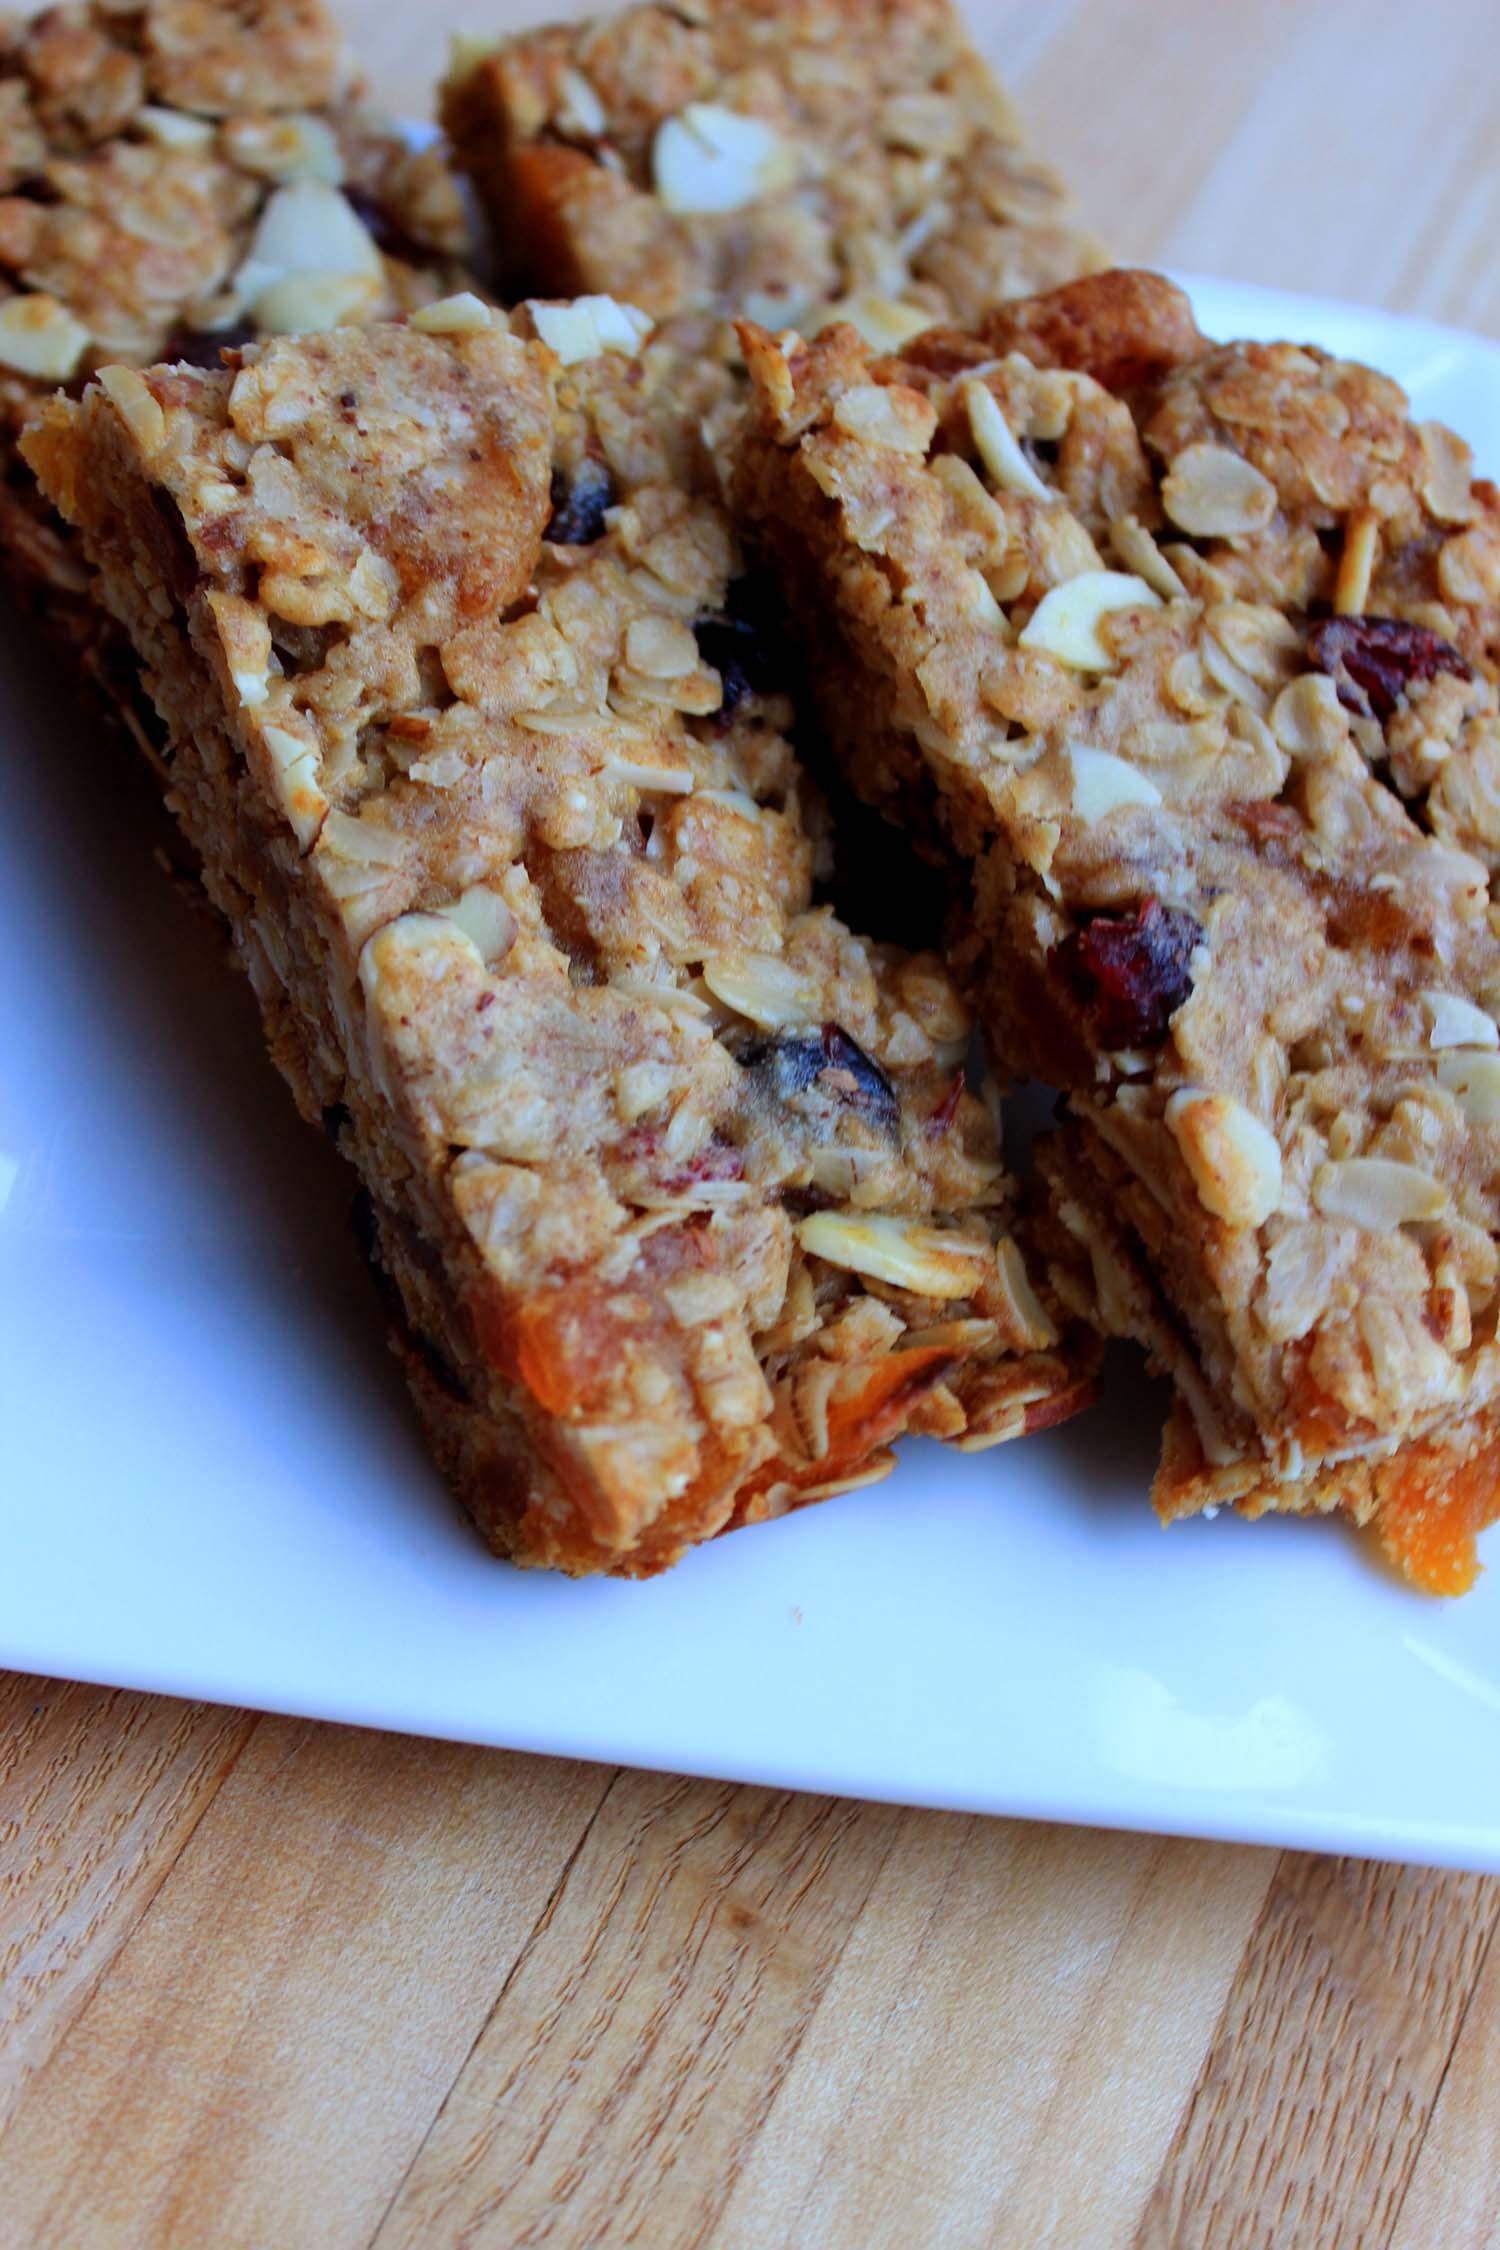 Cranberry Apricot Almond Granola Bars  | Image:  Laura Messersmith